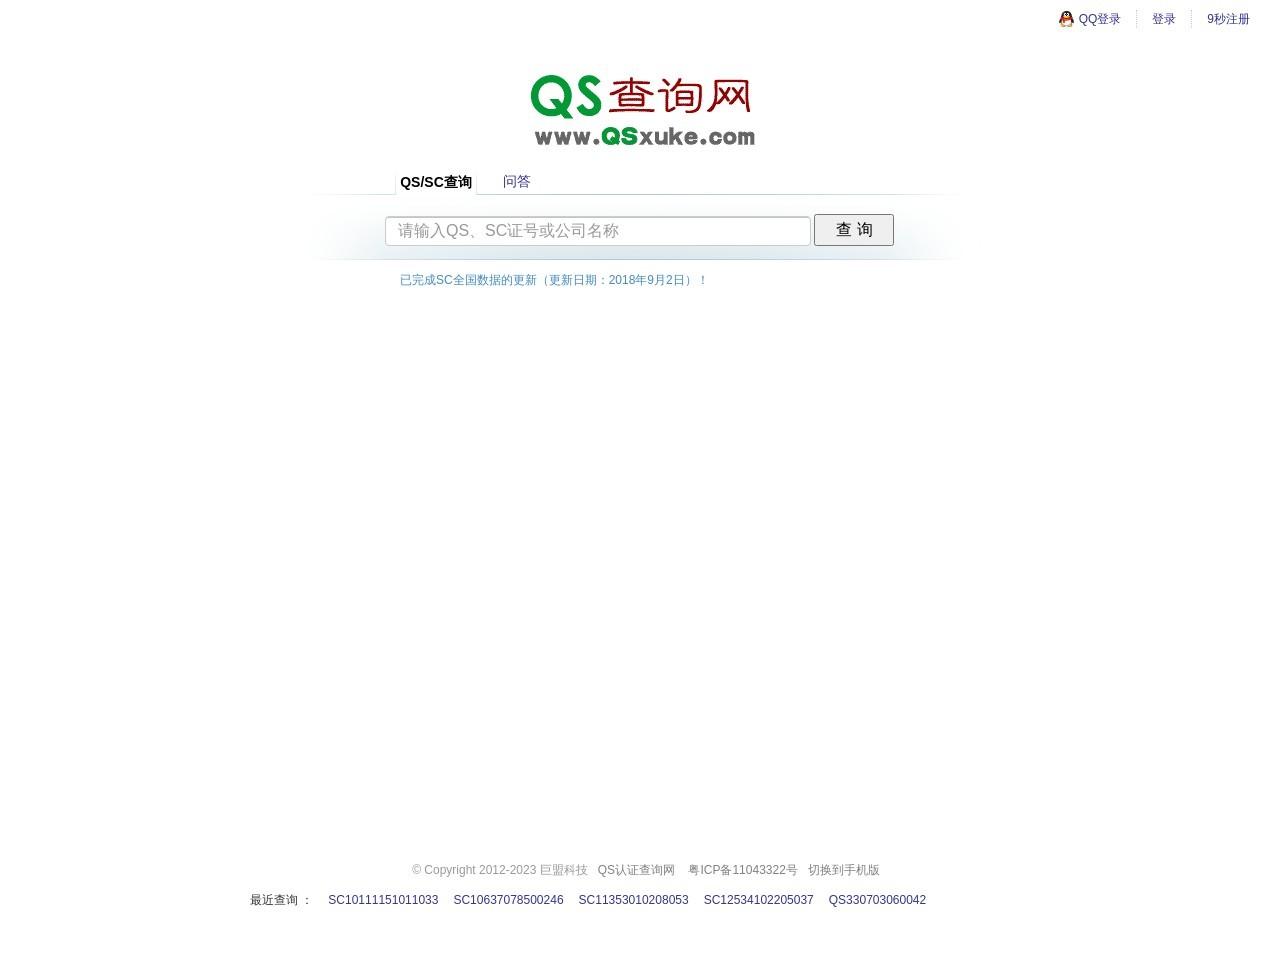 QS查询网